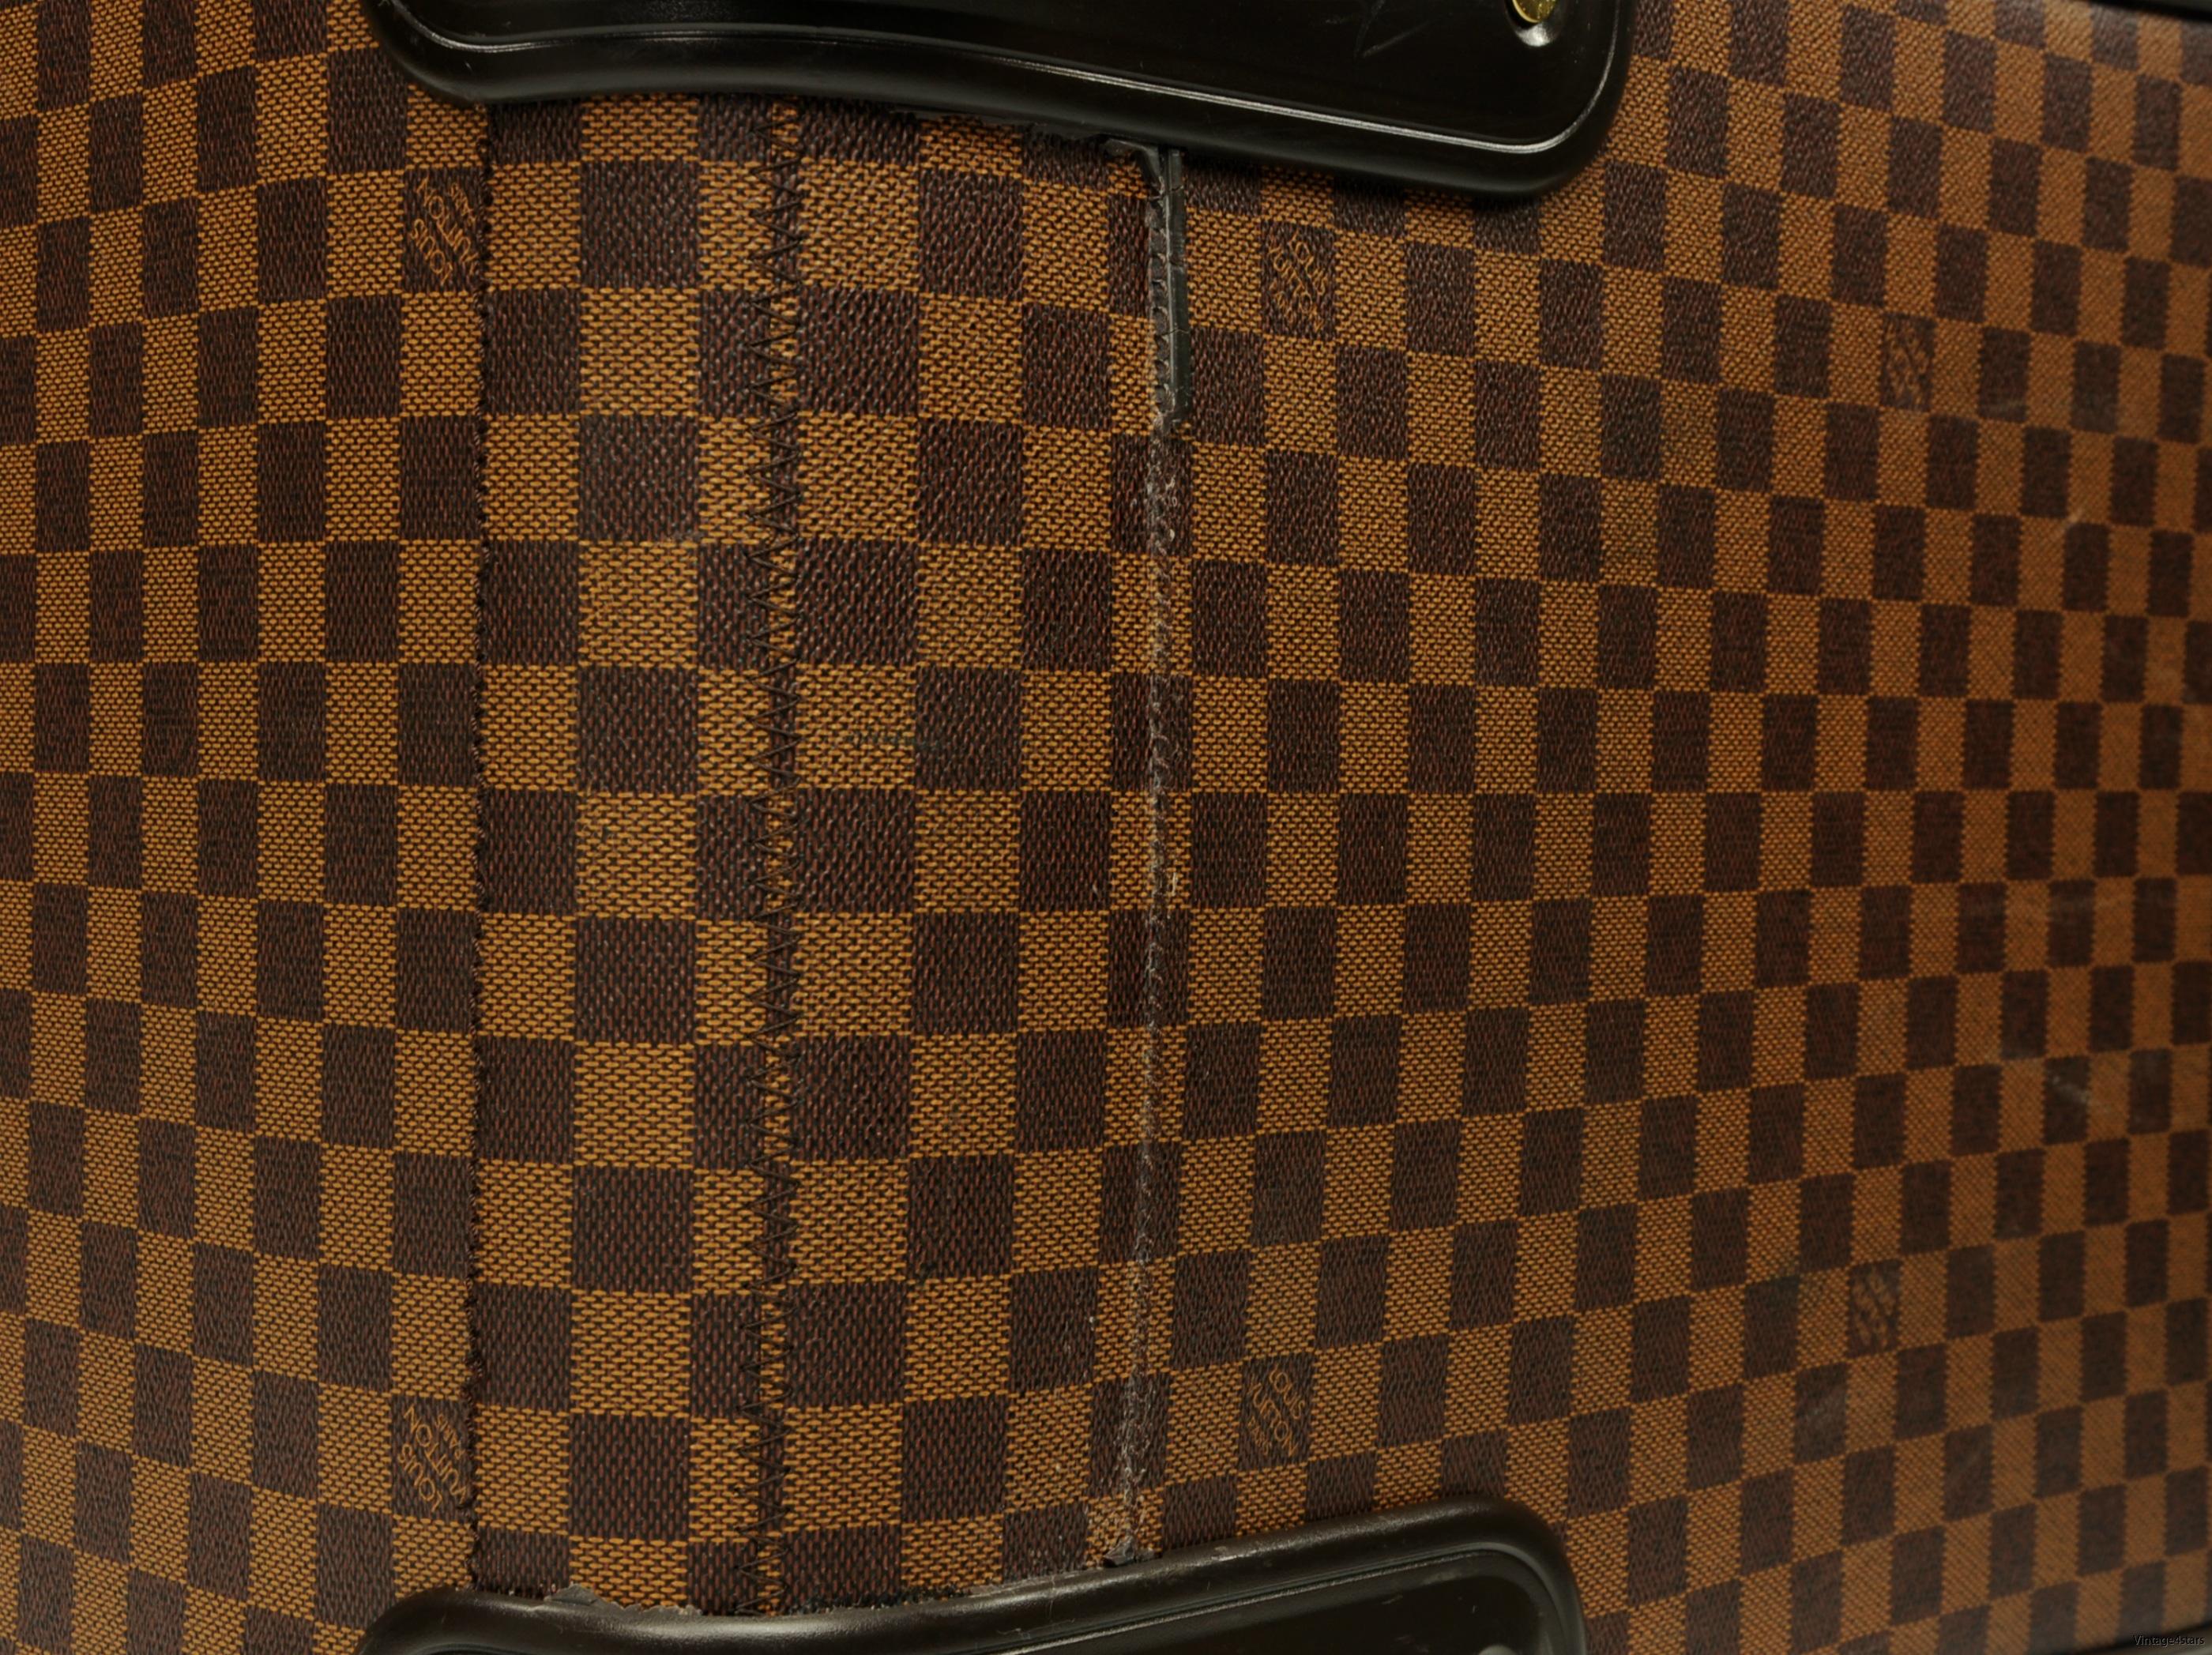 Louis Vuitton Eole 60 Damier Ebene 17